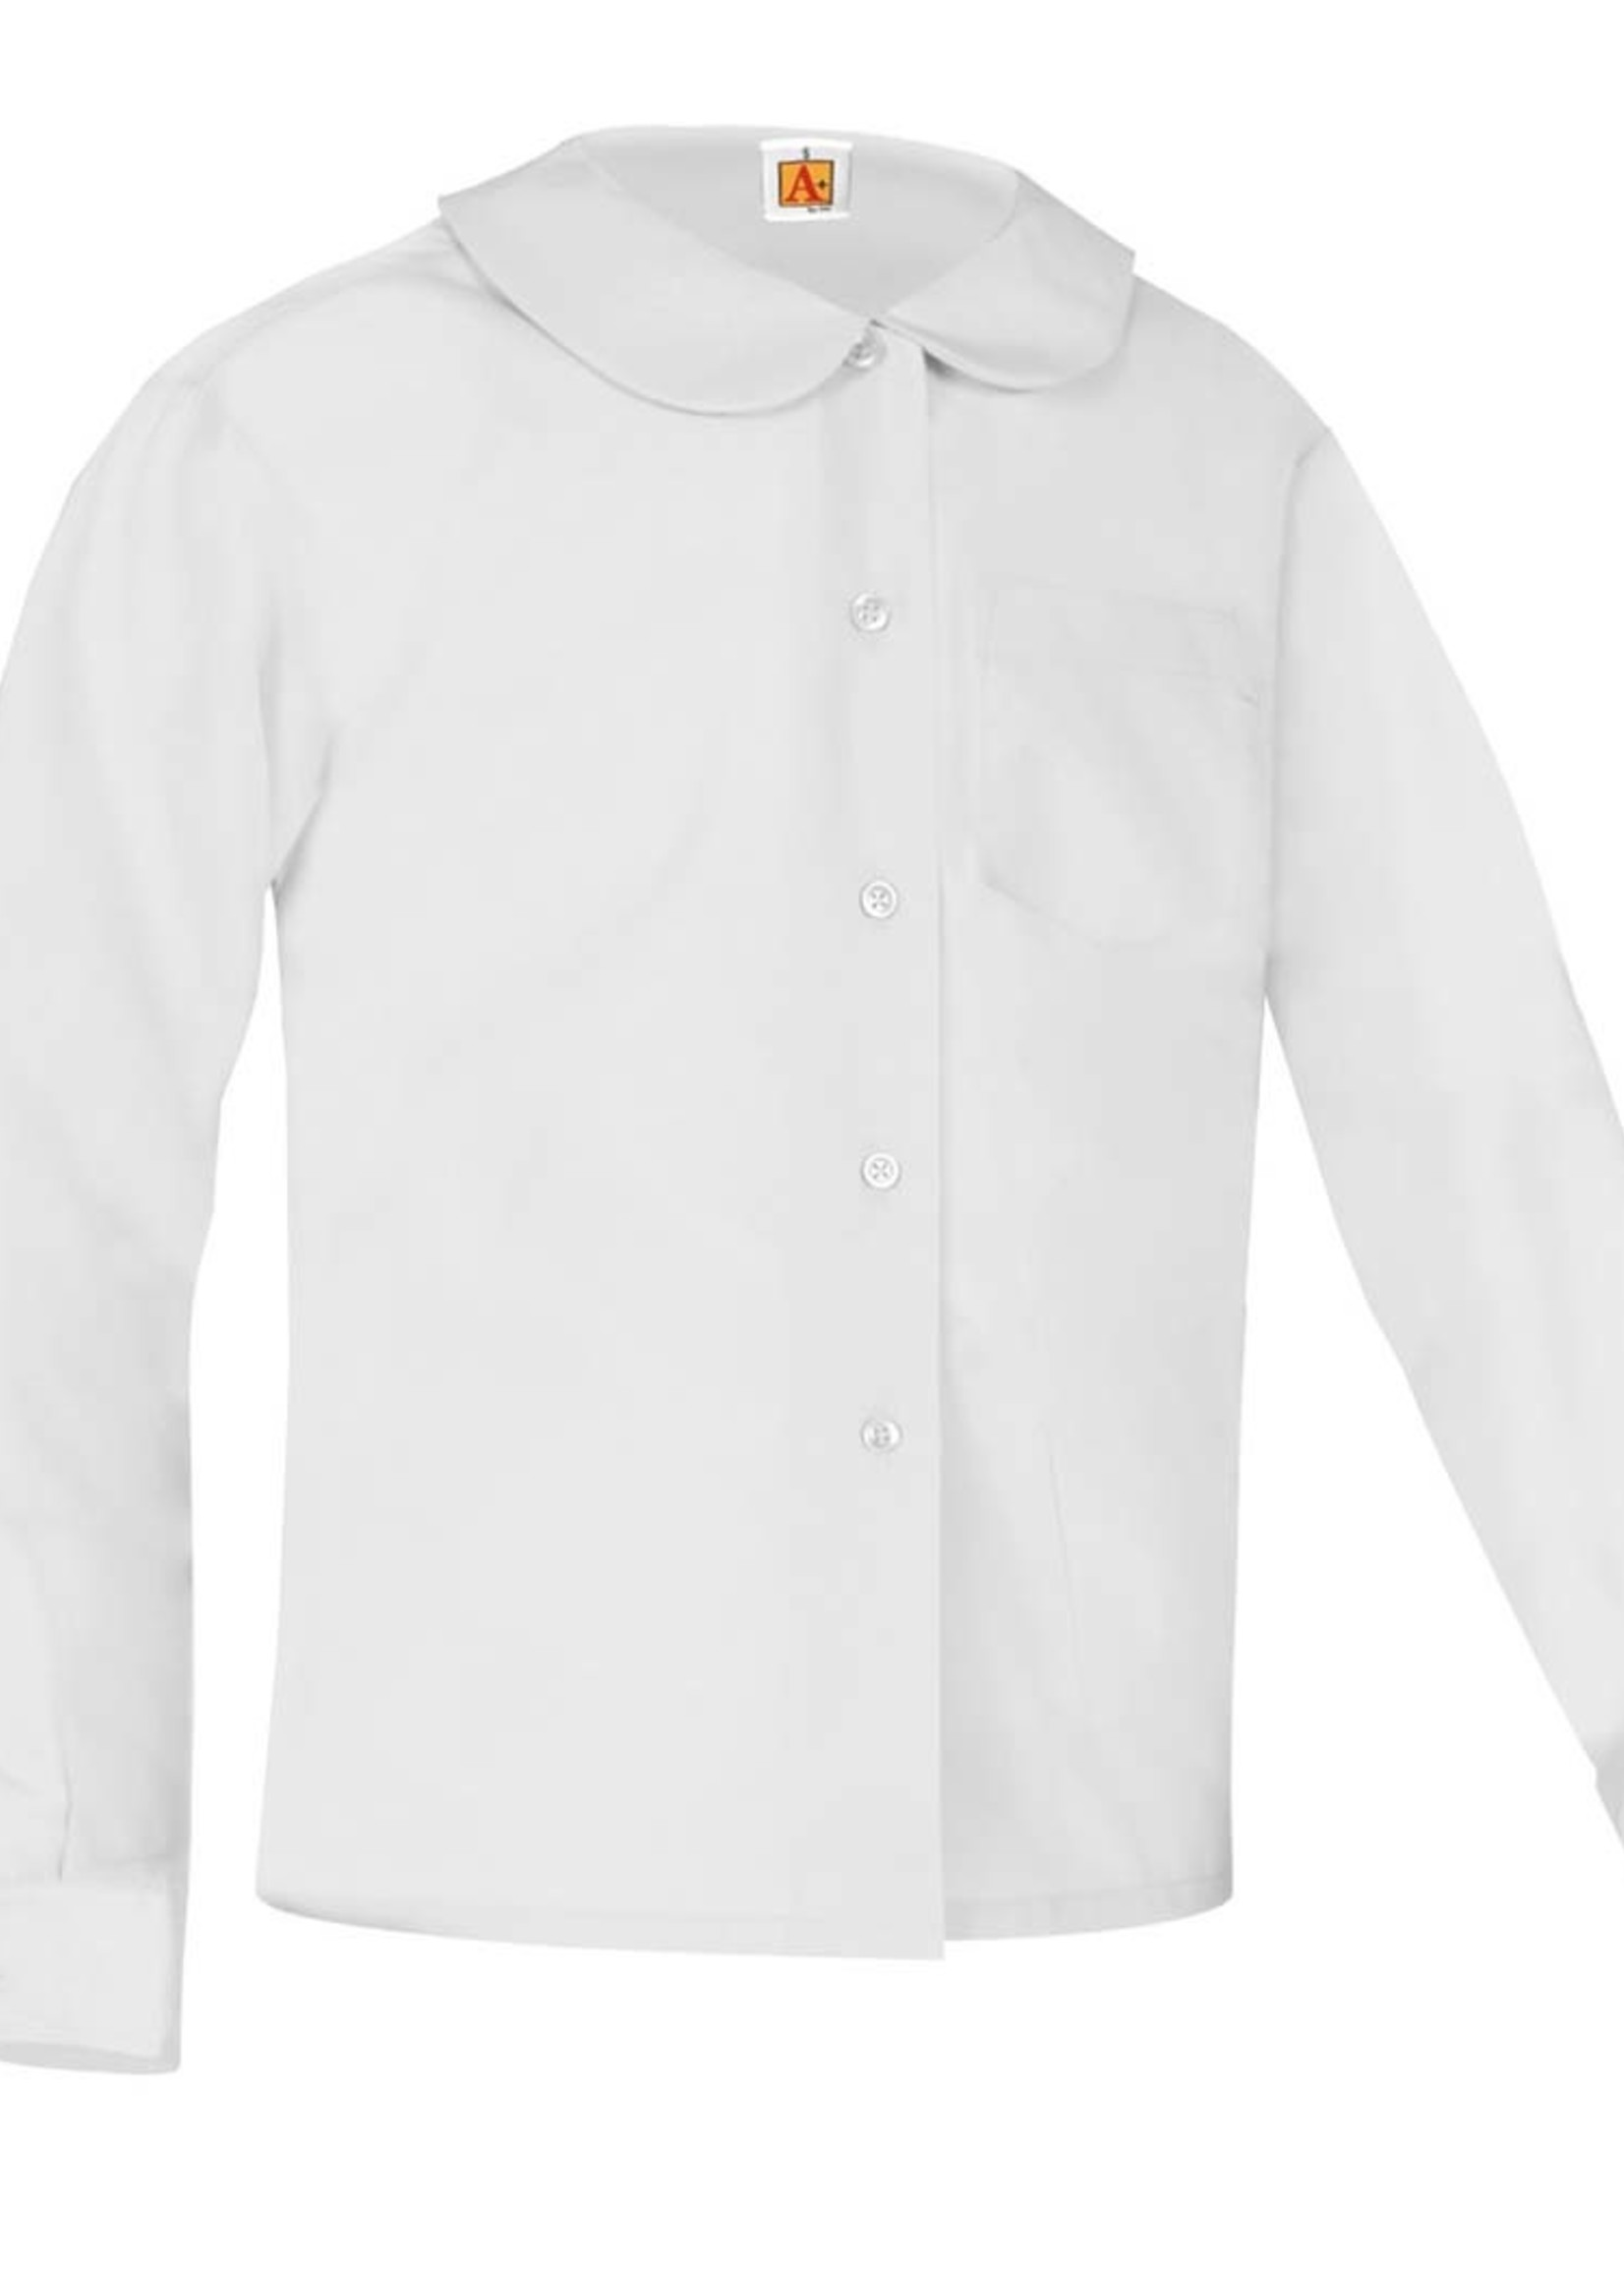 A+ White Long Sleeve Peter Pan Blouse w/o Pocket